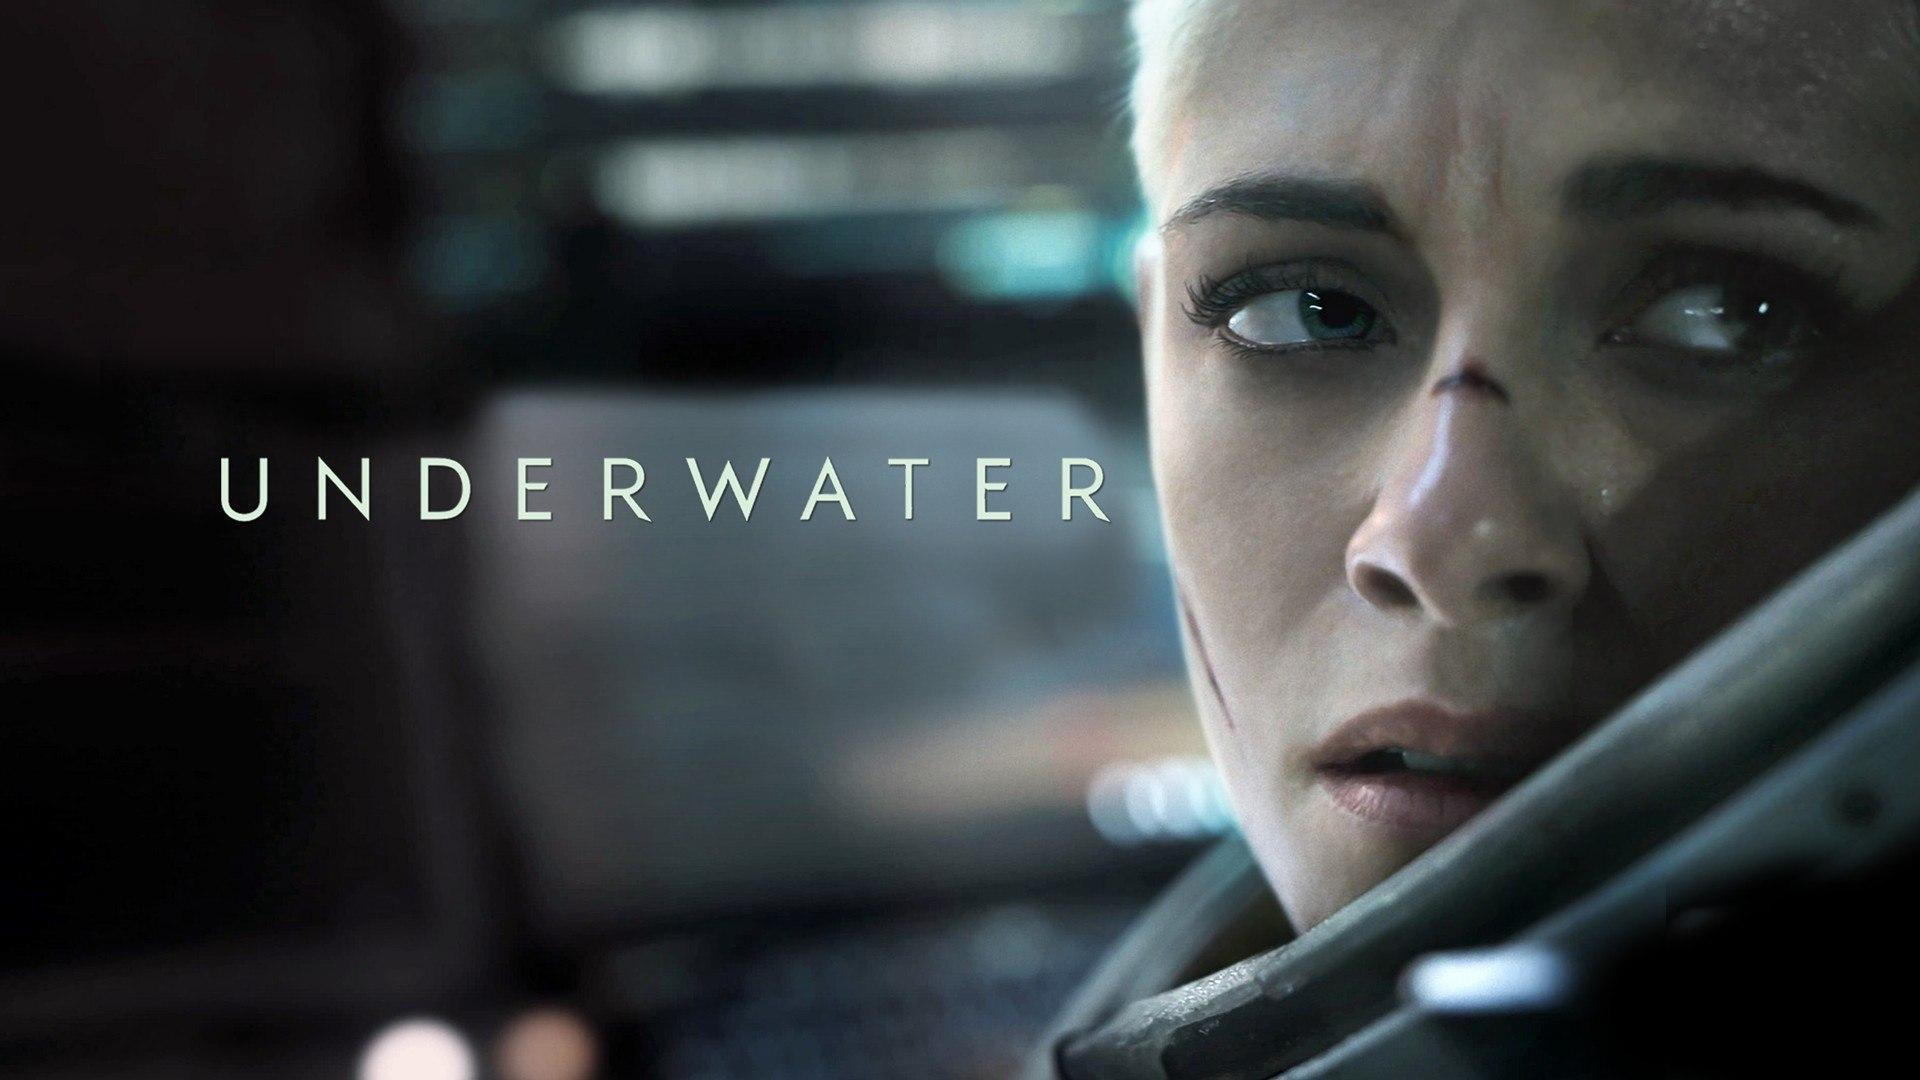 Martedi 6 Ottobre 2020 Sky Cinema HD, Underwater